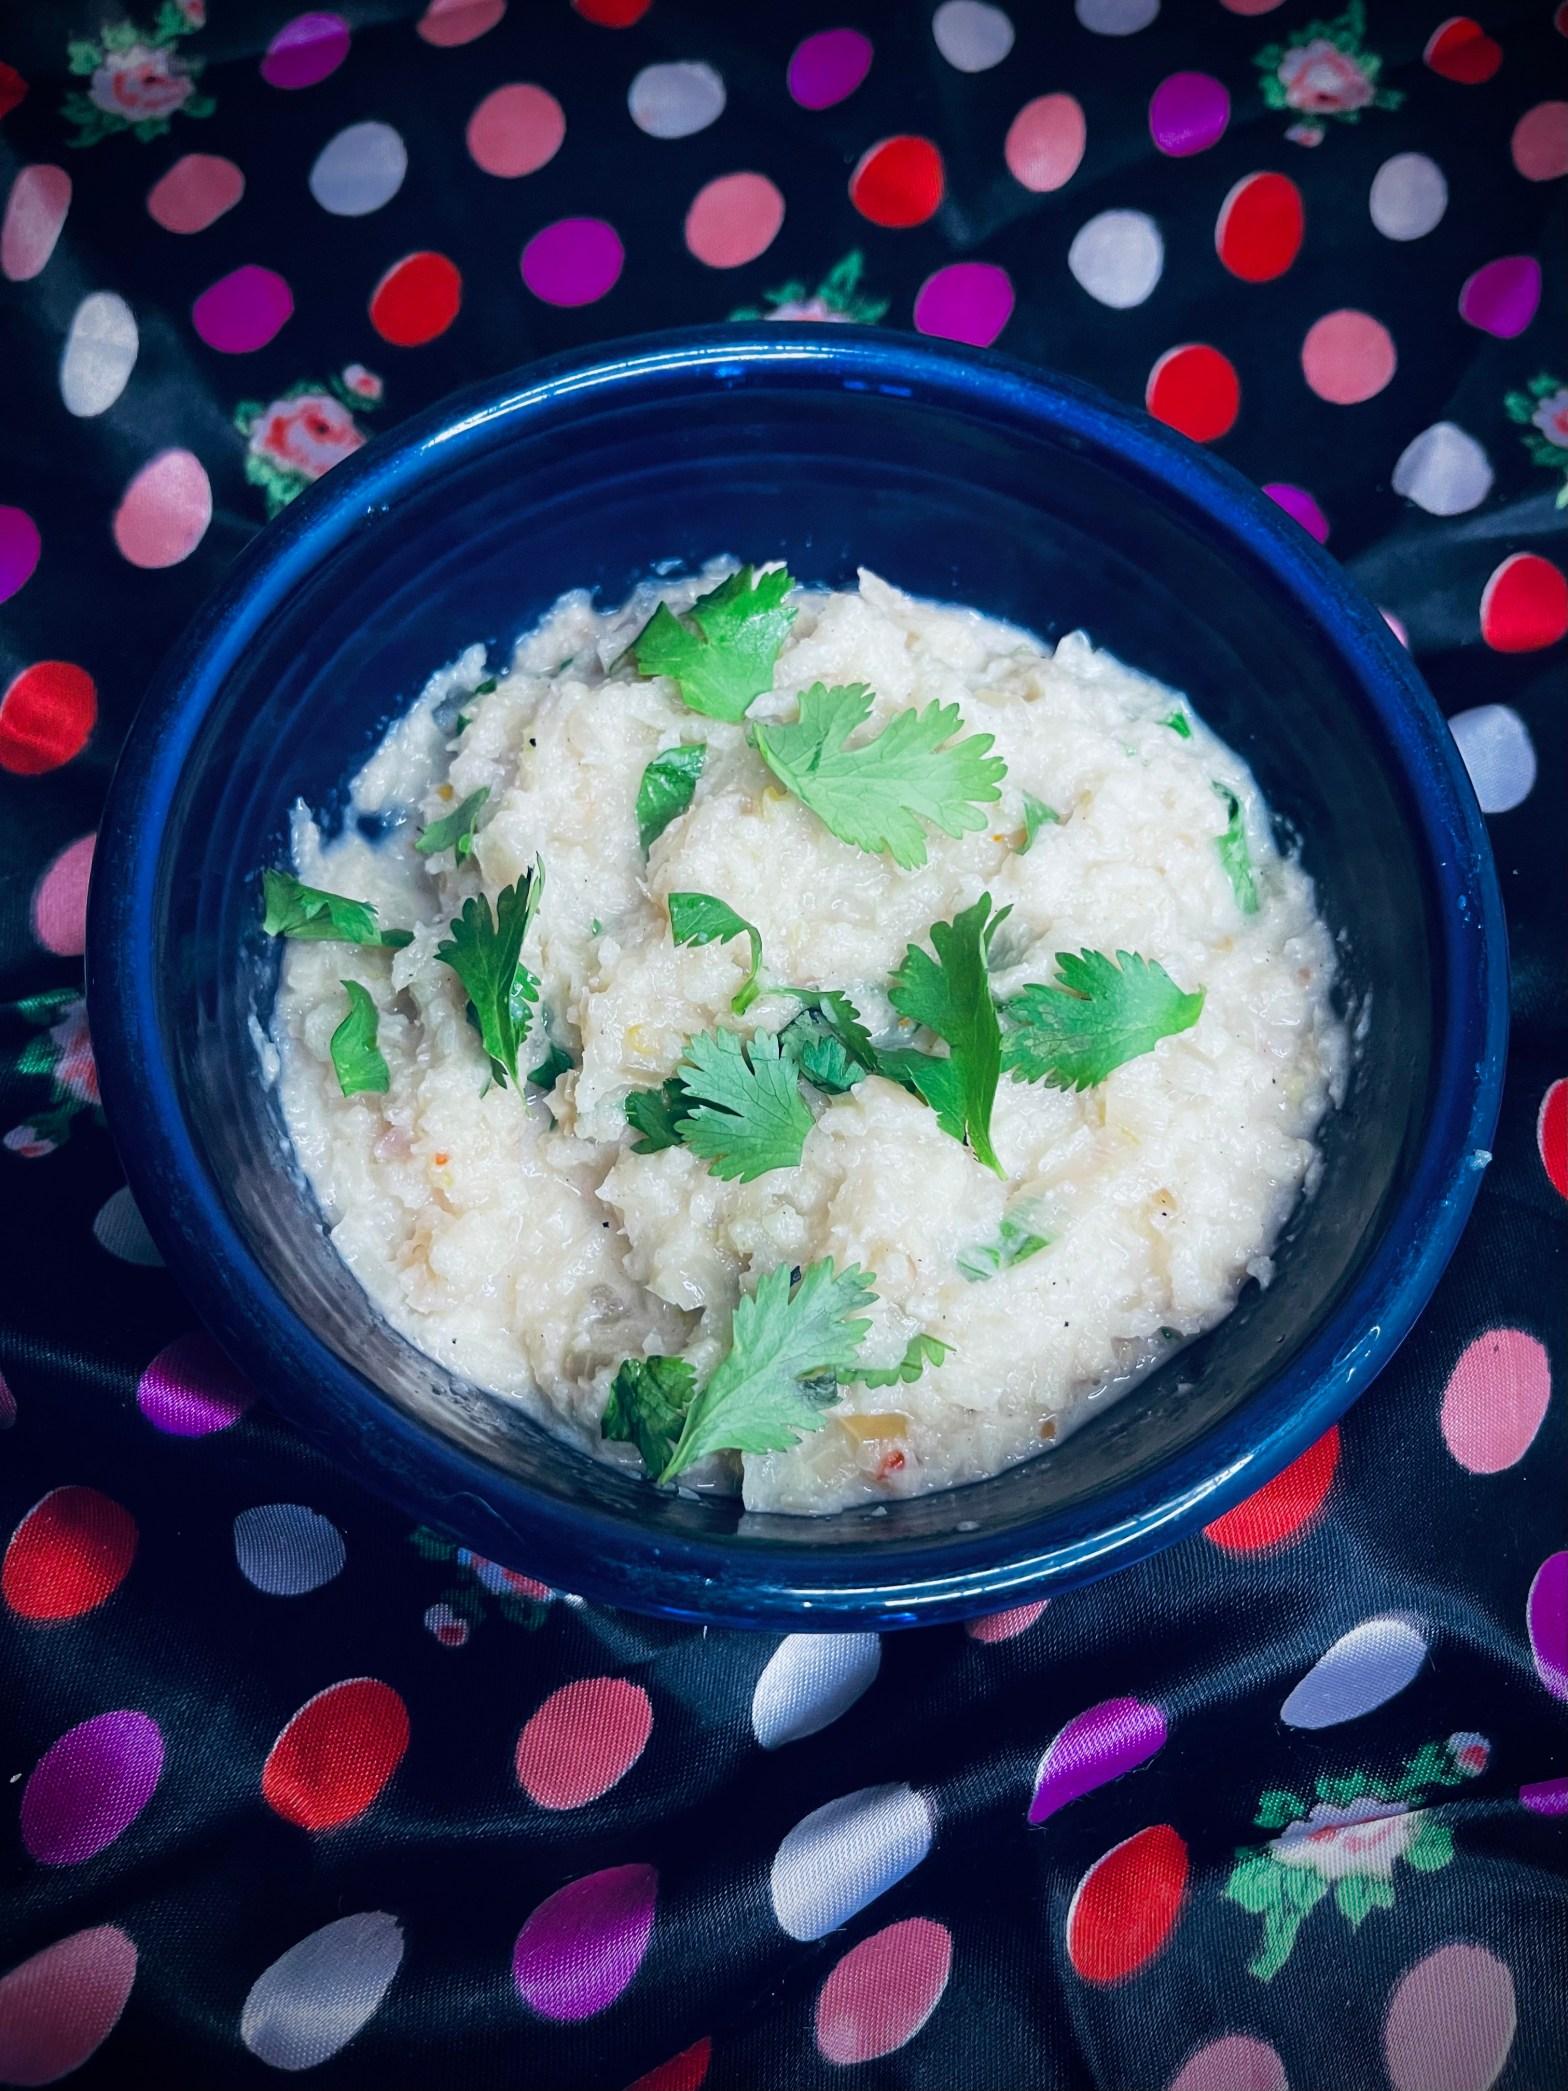 cauliflower rice garnished with cilantro